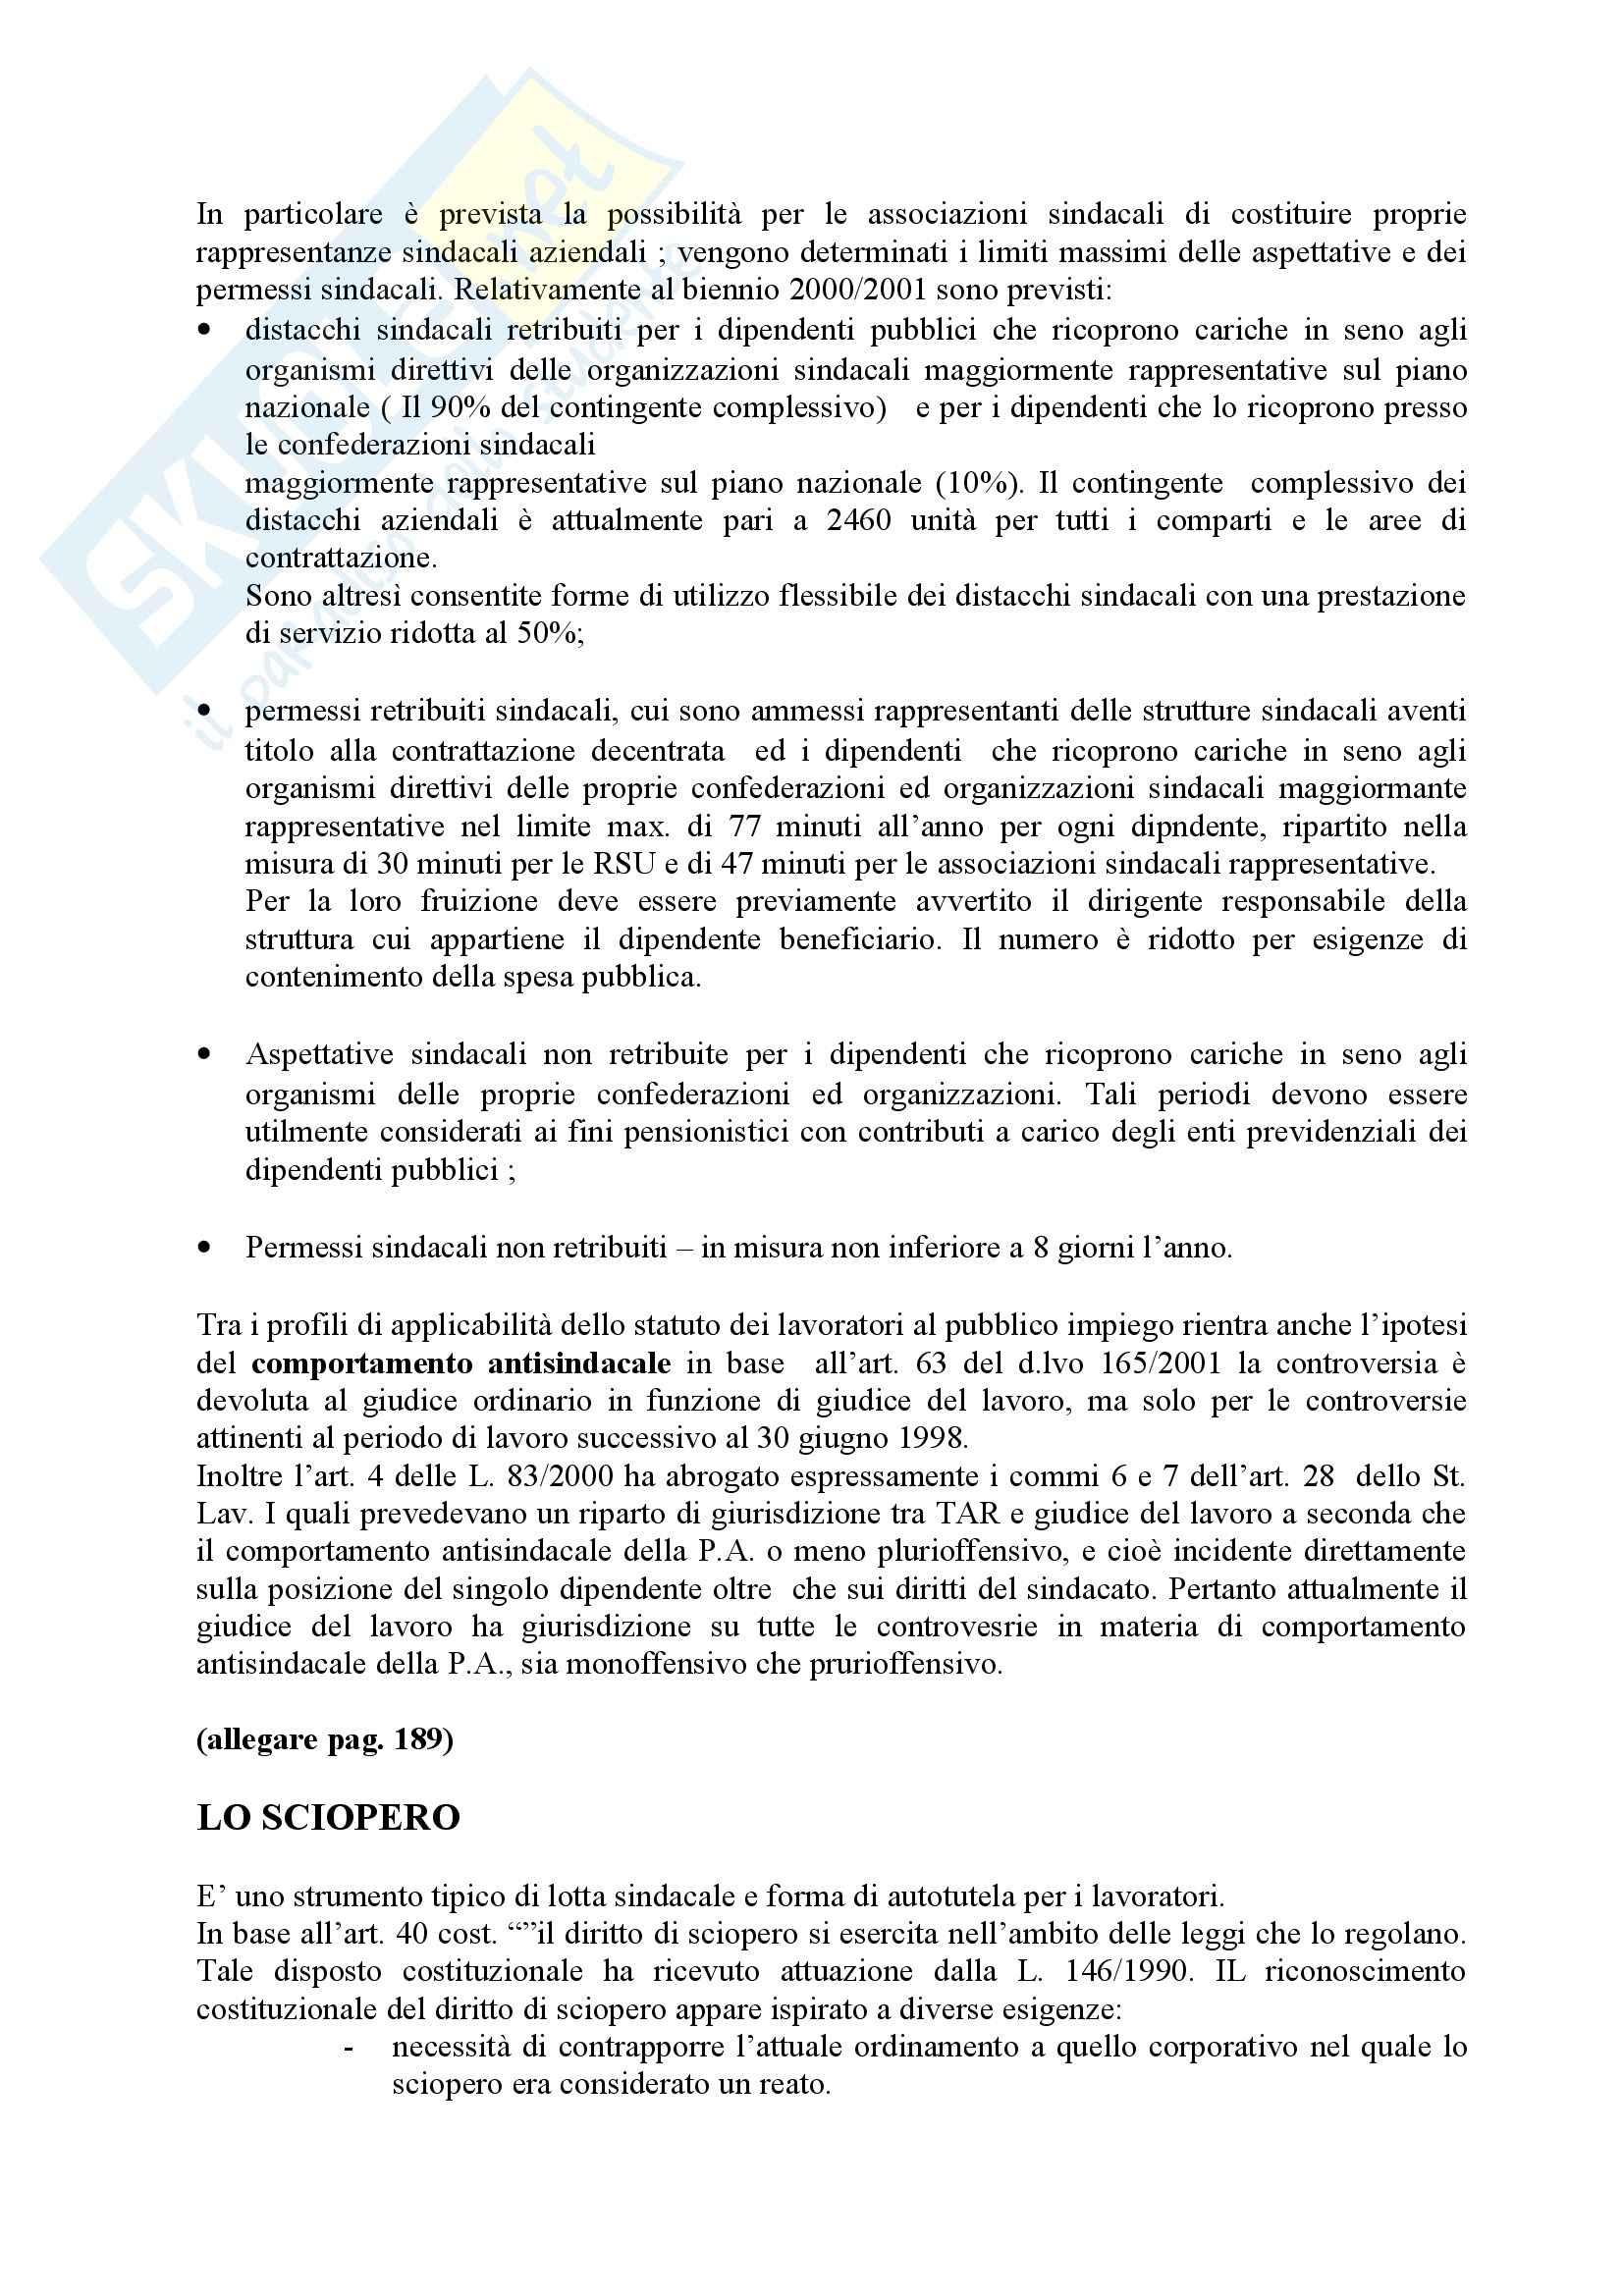 Diritto sindacale - l'organizzazione sindacale Pag. 46